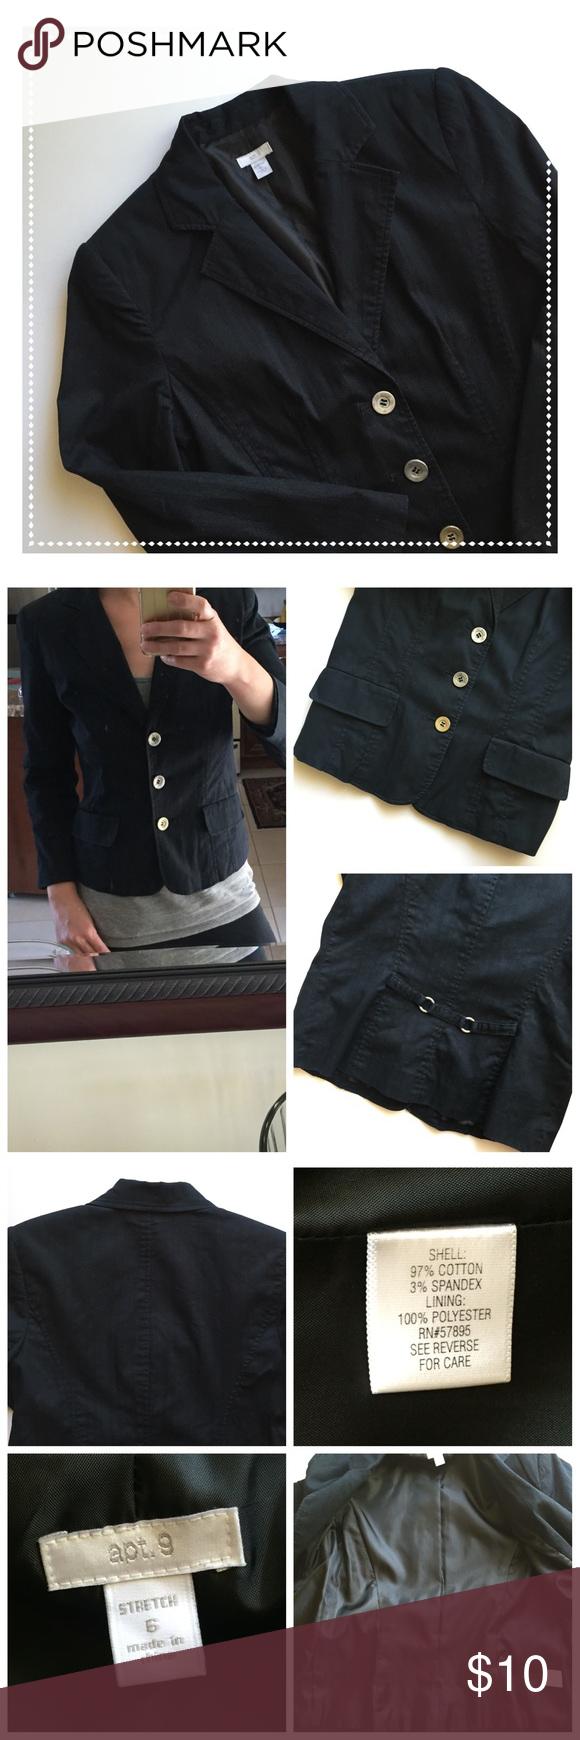 BOGO SALE Lined Cotton Blazer Fully lined cotton 97% spandex 3 ...